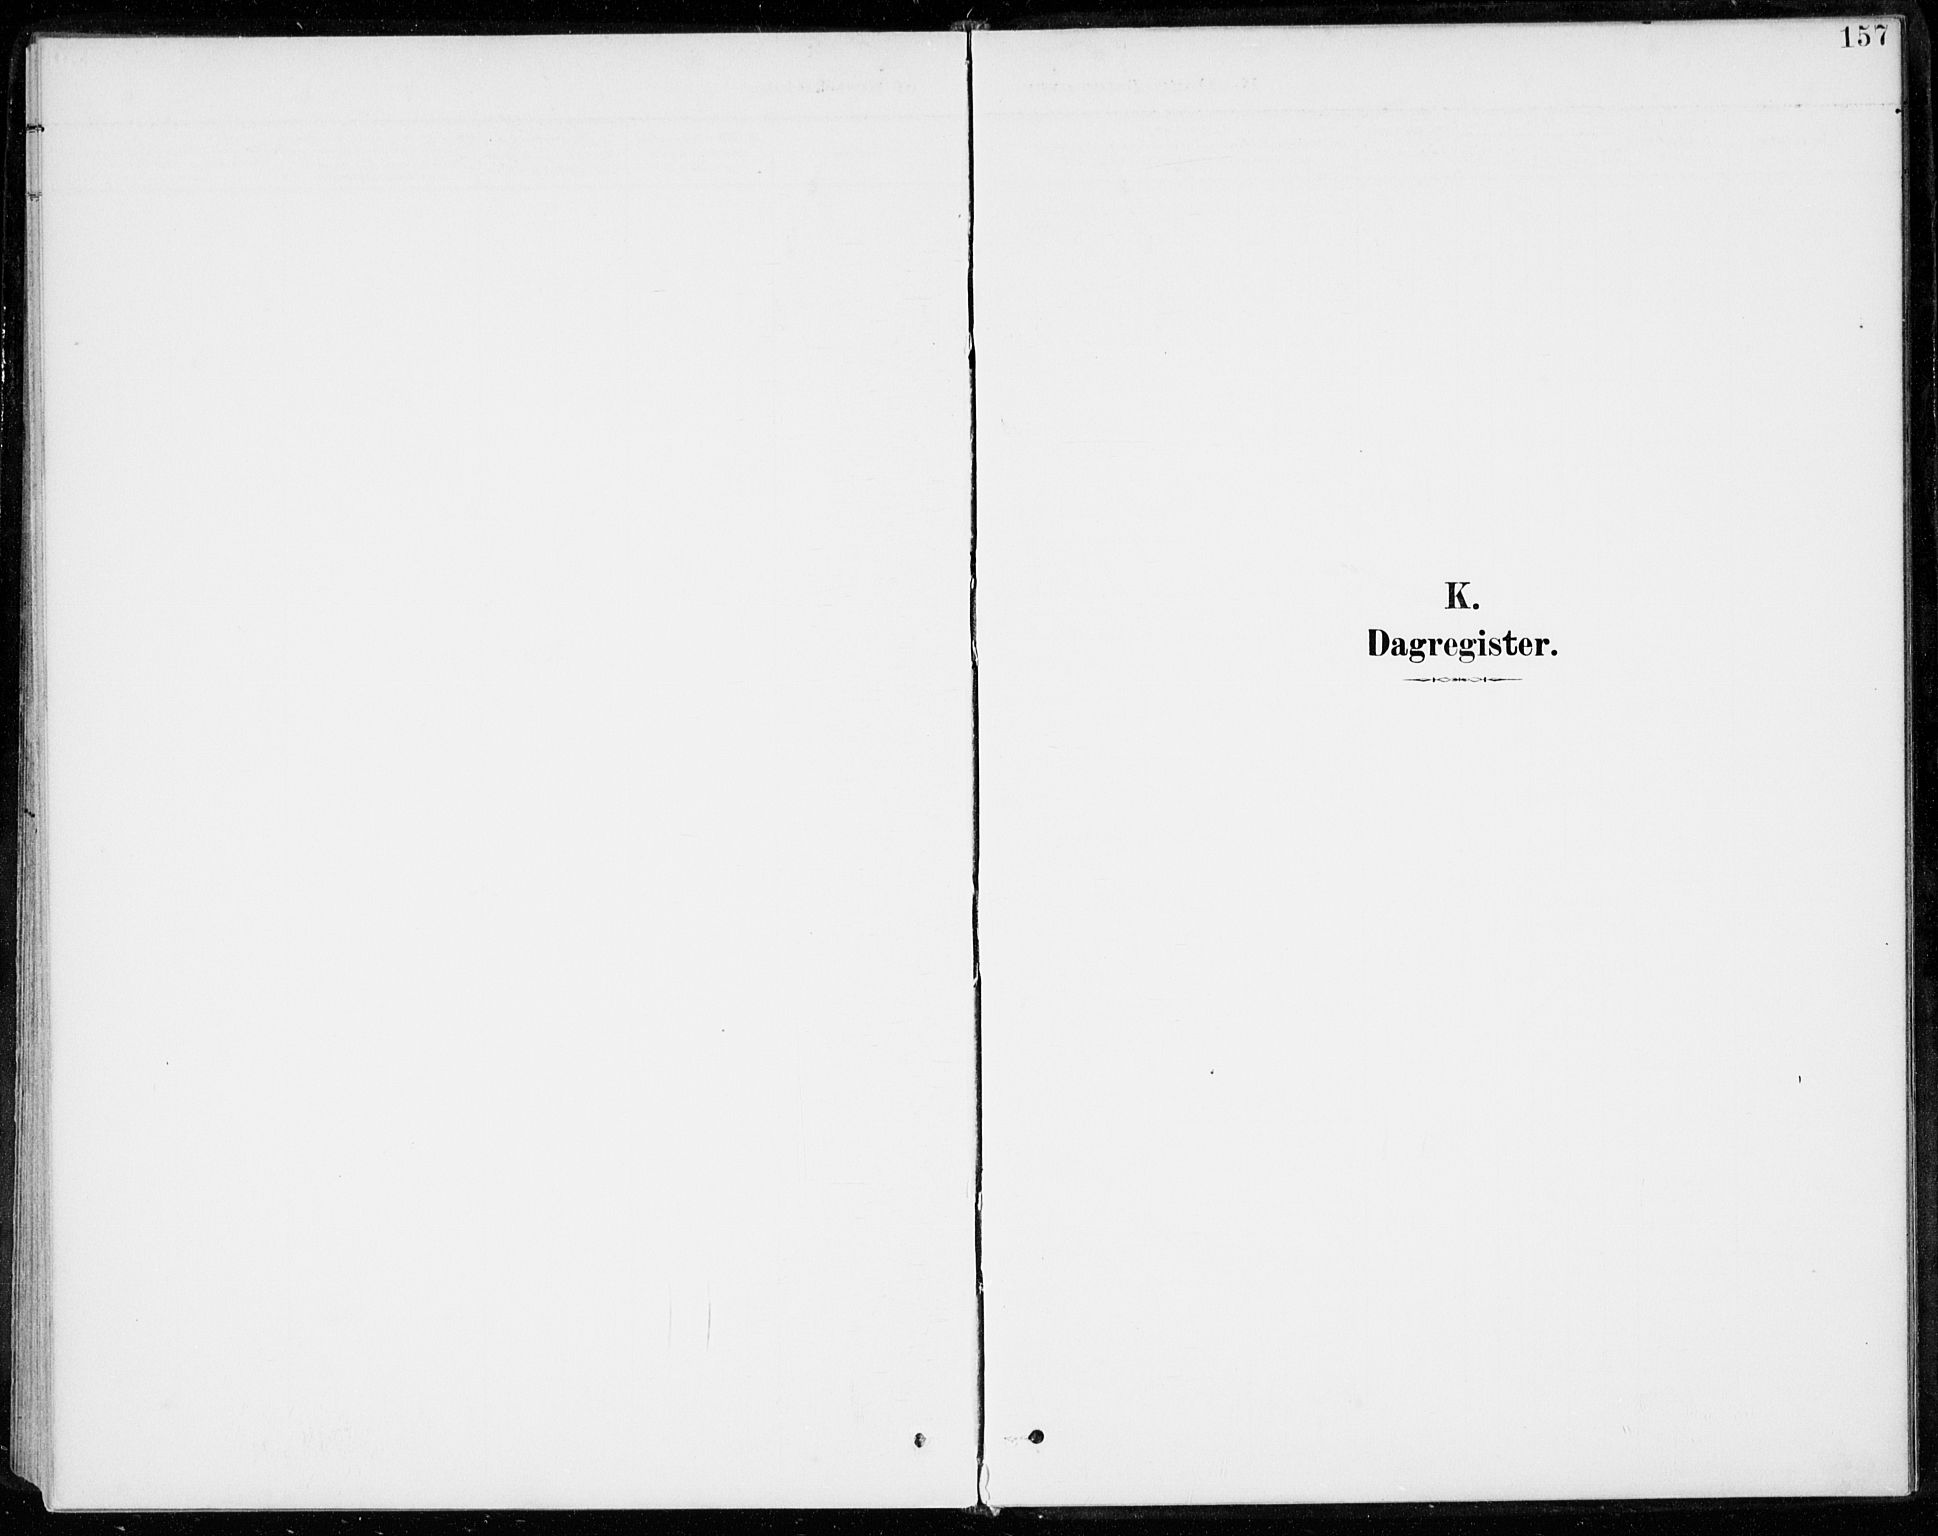 SAKO, Sigdal kirkebøker, F/Fc/L0002: Ministerialbok nr. III 2, 1894-1911, s. 157